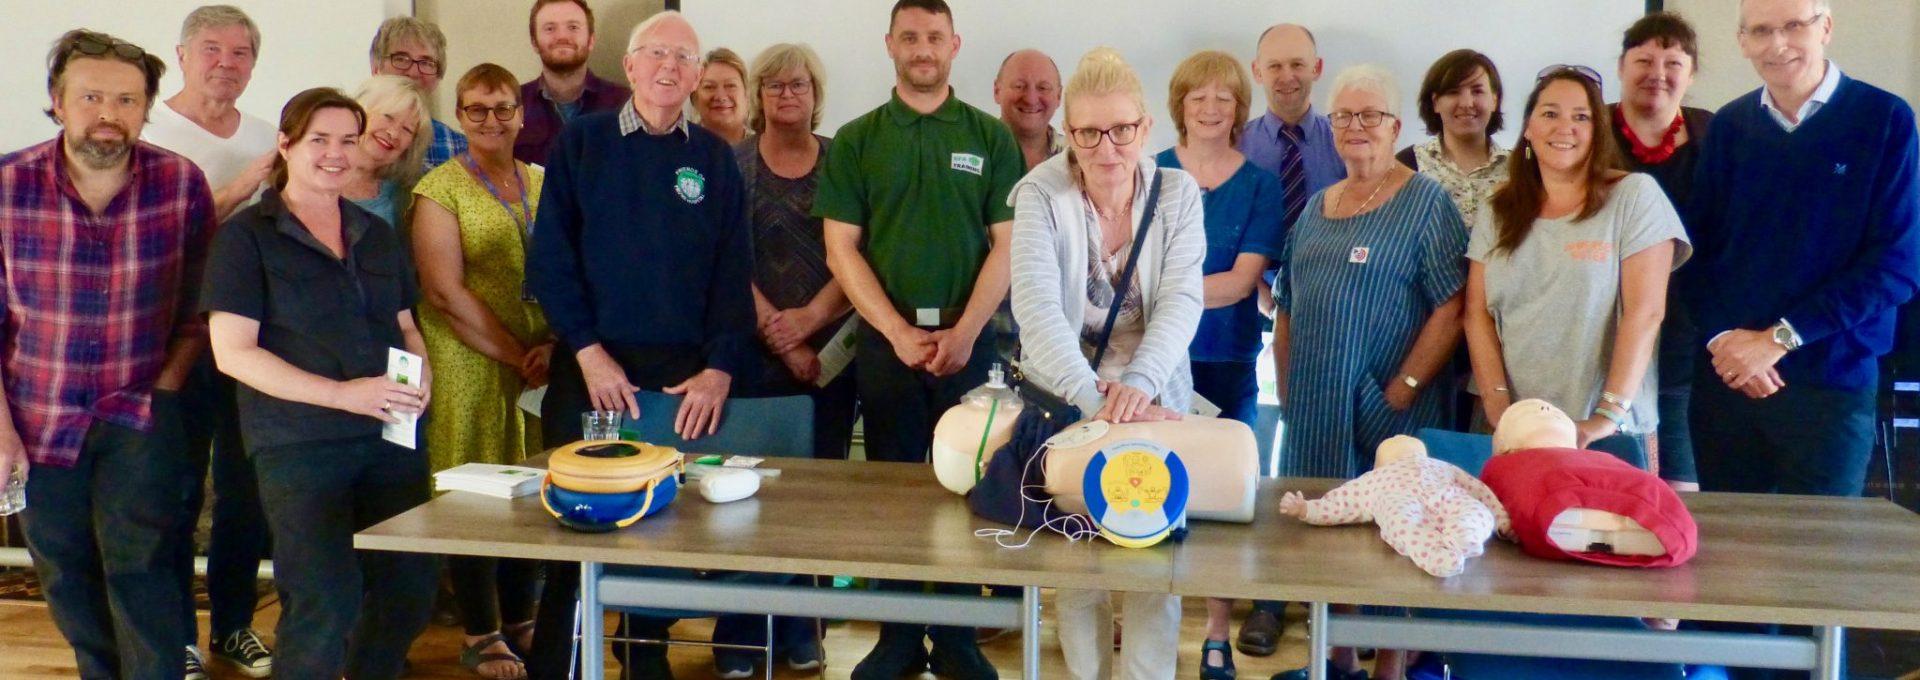 Defibrillator training for council